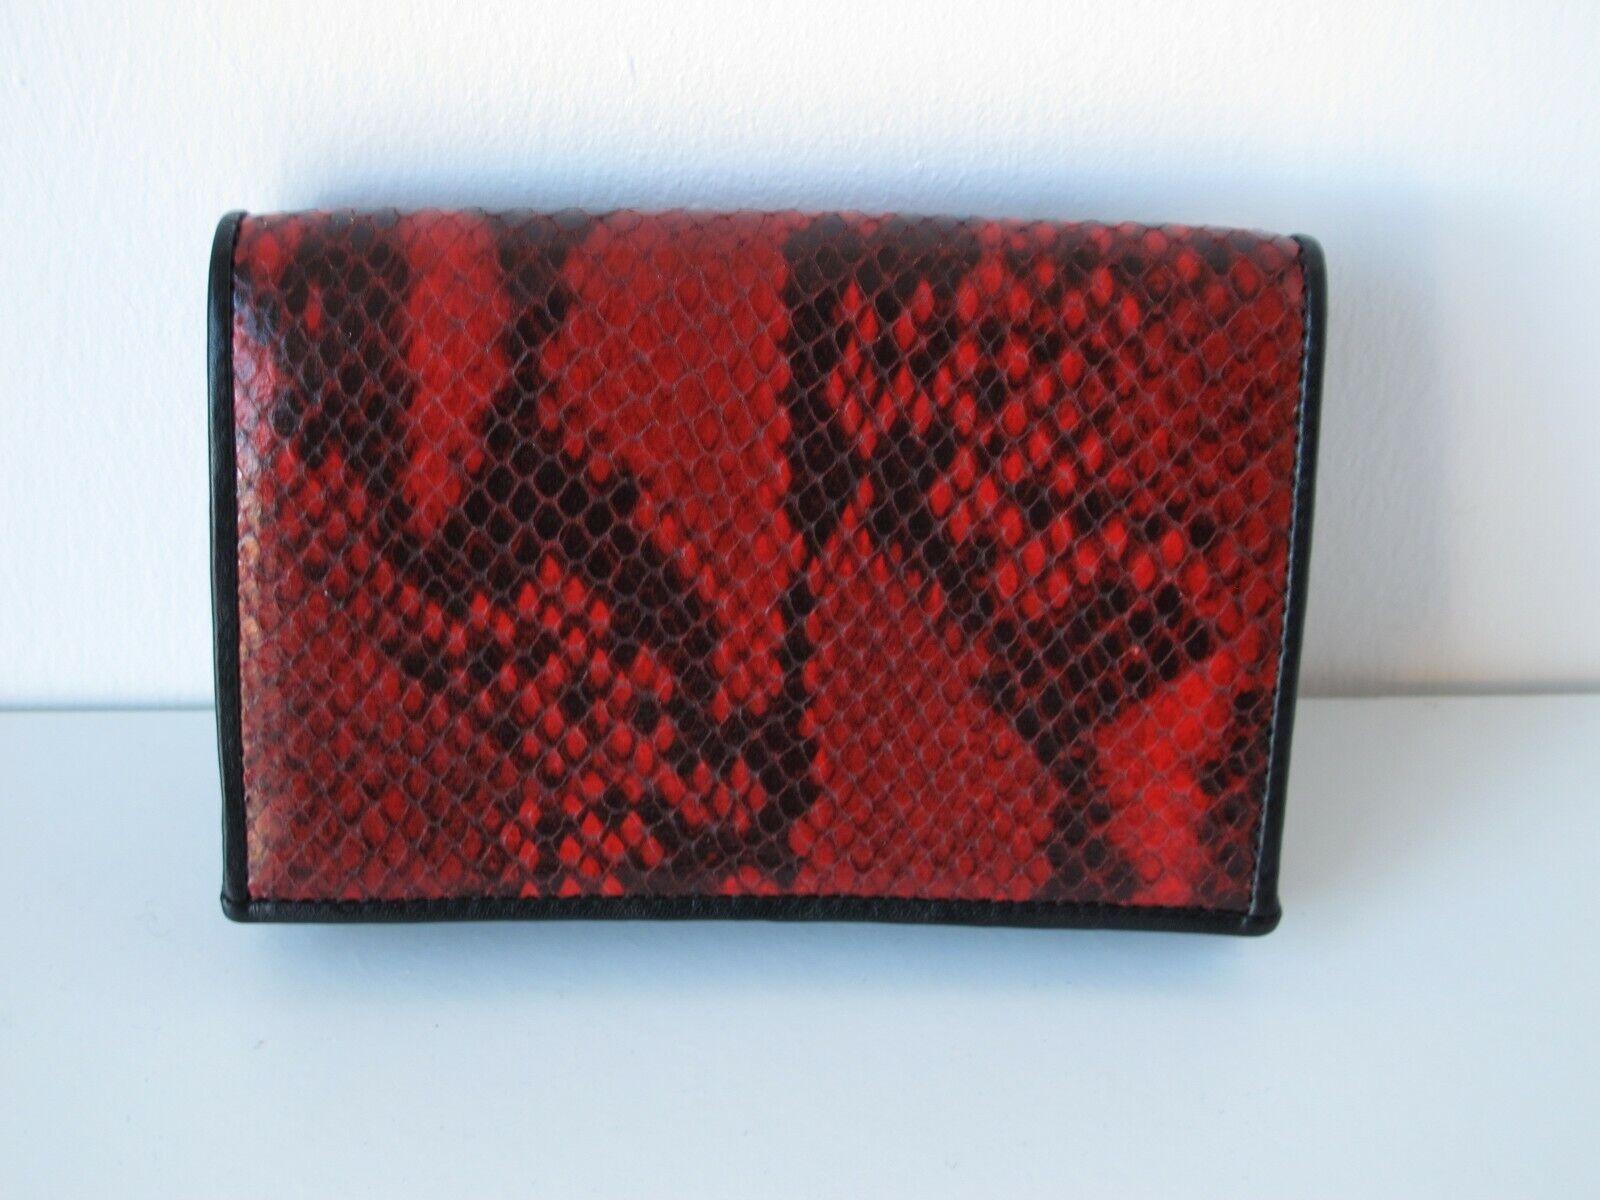 Paul Smith medium red snake-effect concertina purse